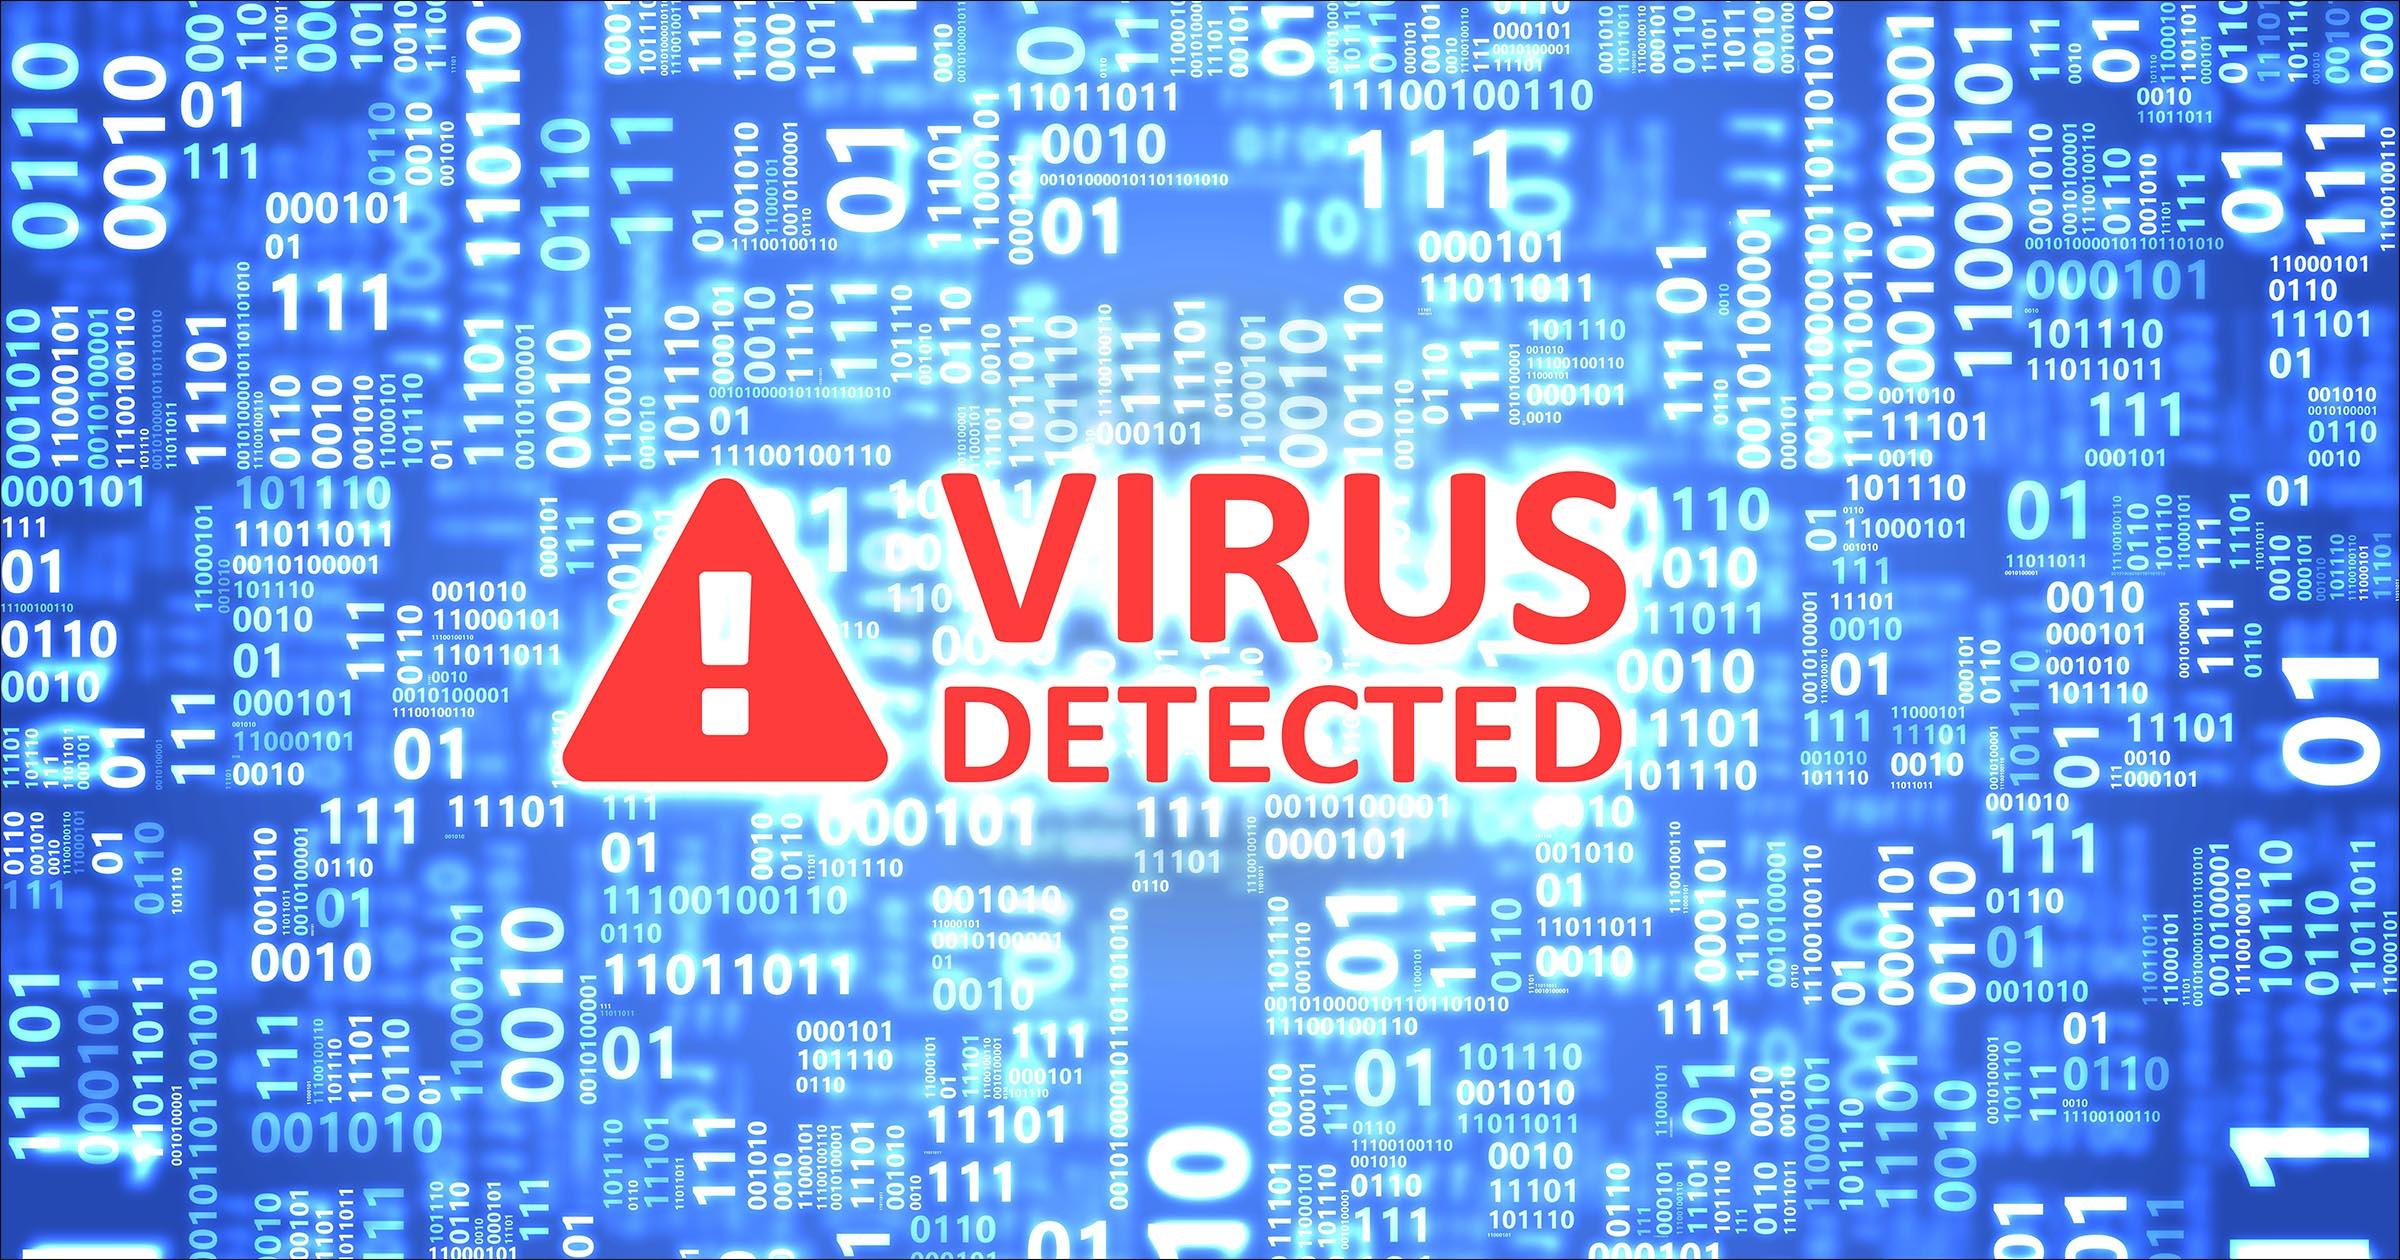 Virus Detected!